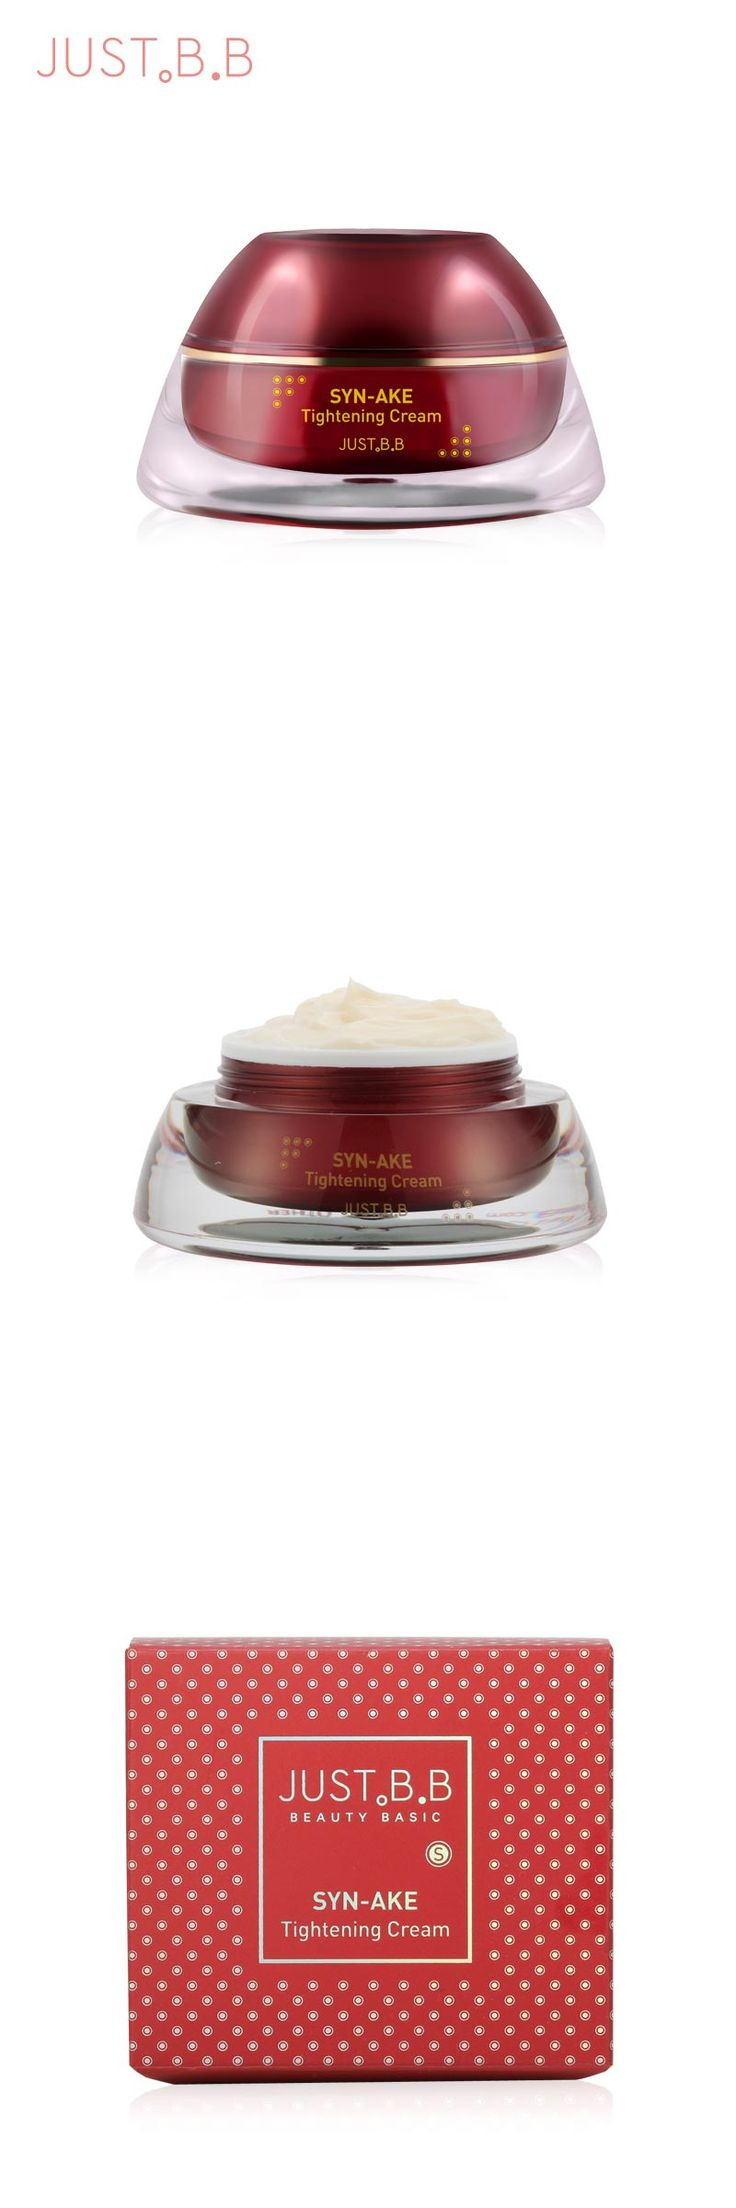 Skin Care Snake Venom Cream For Anti-Aging Anti Wrinkle Moisturizing Whitening Tightening Beauty Face Cream Korean Cosmetics